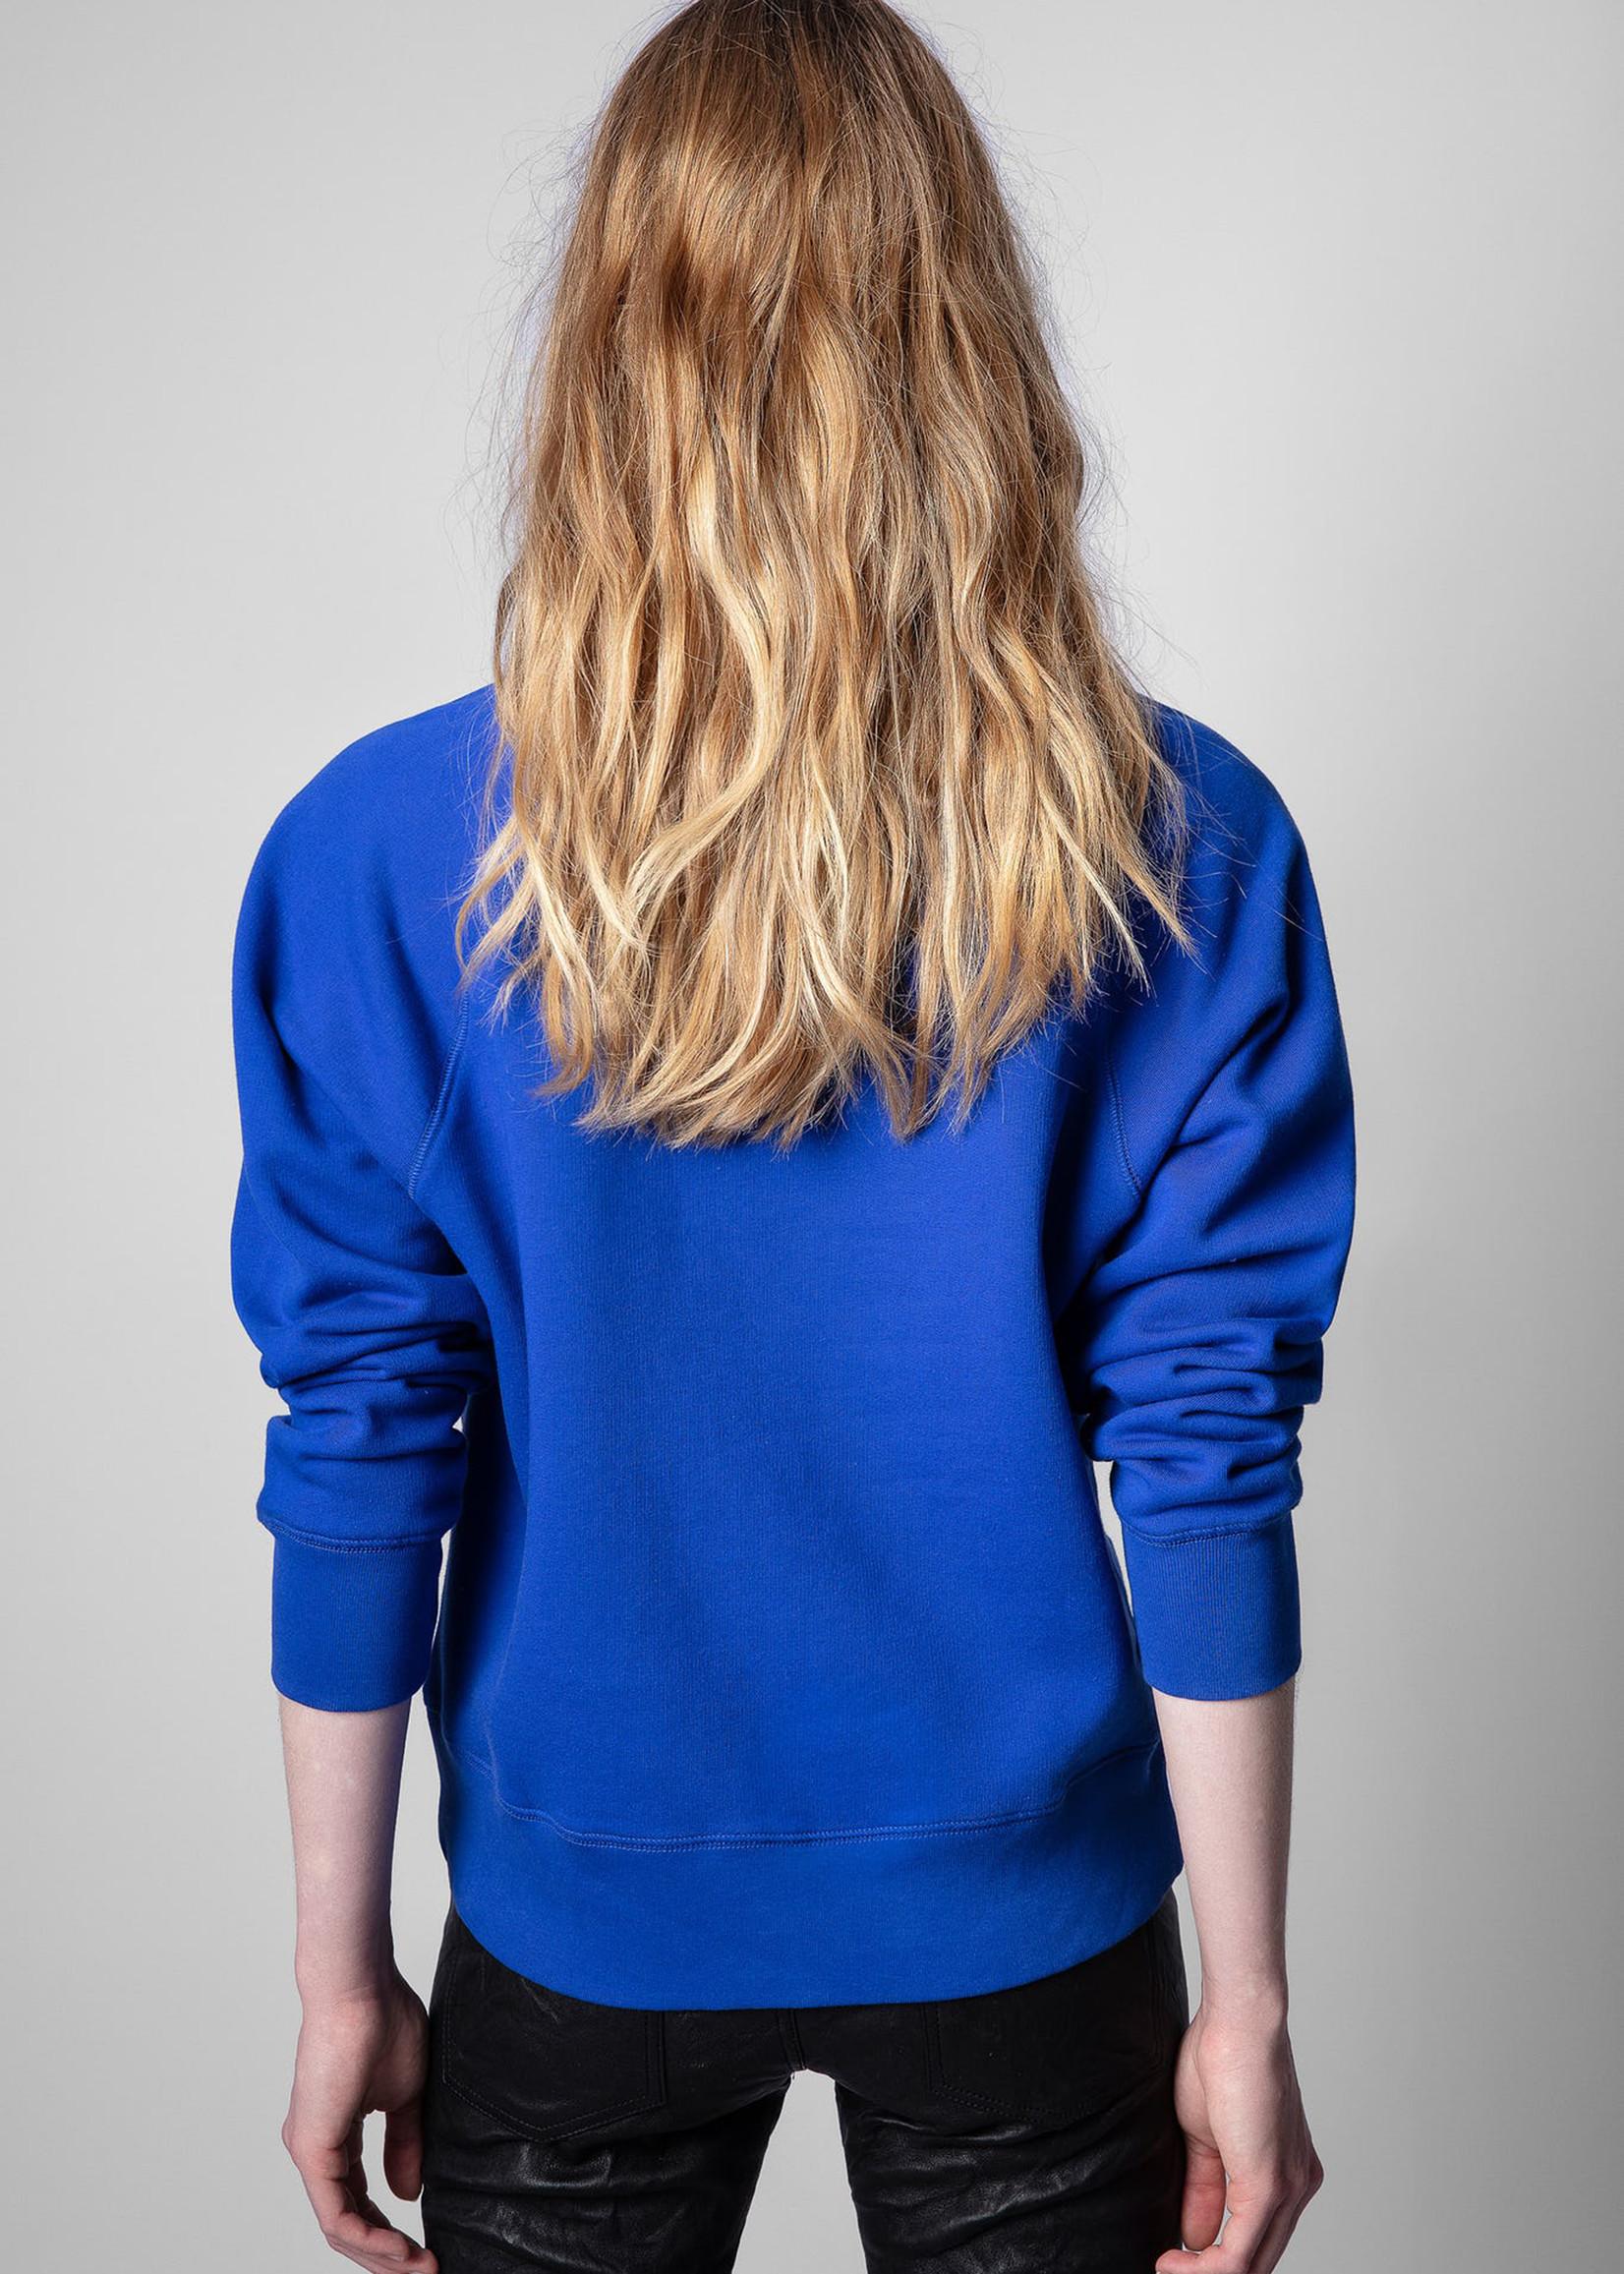 Zadig & Voltaire Upper Blason Royal Blue